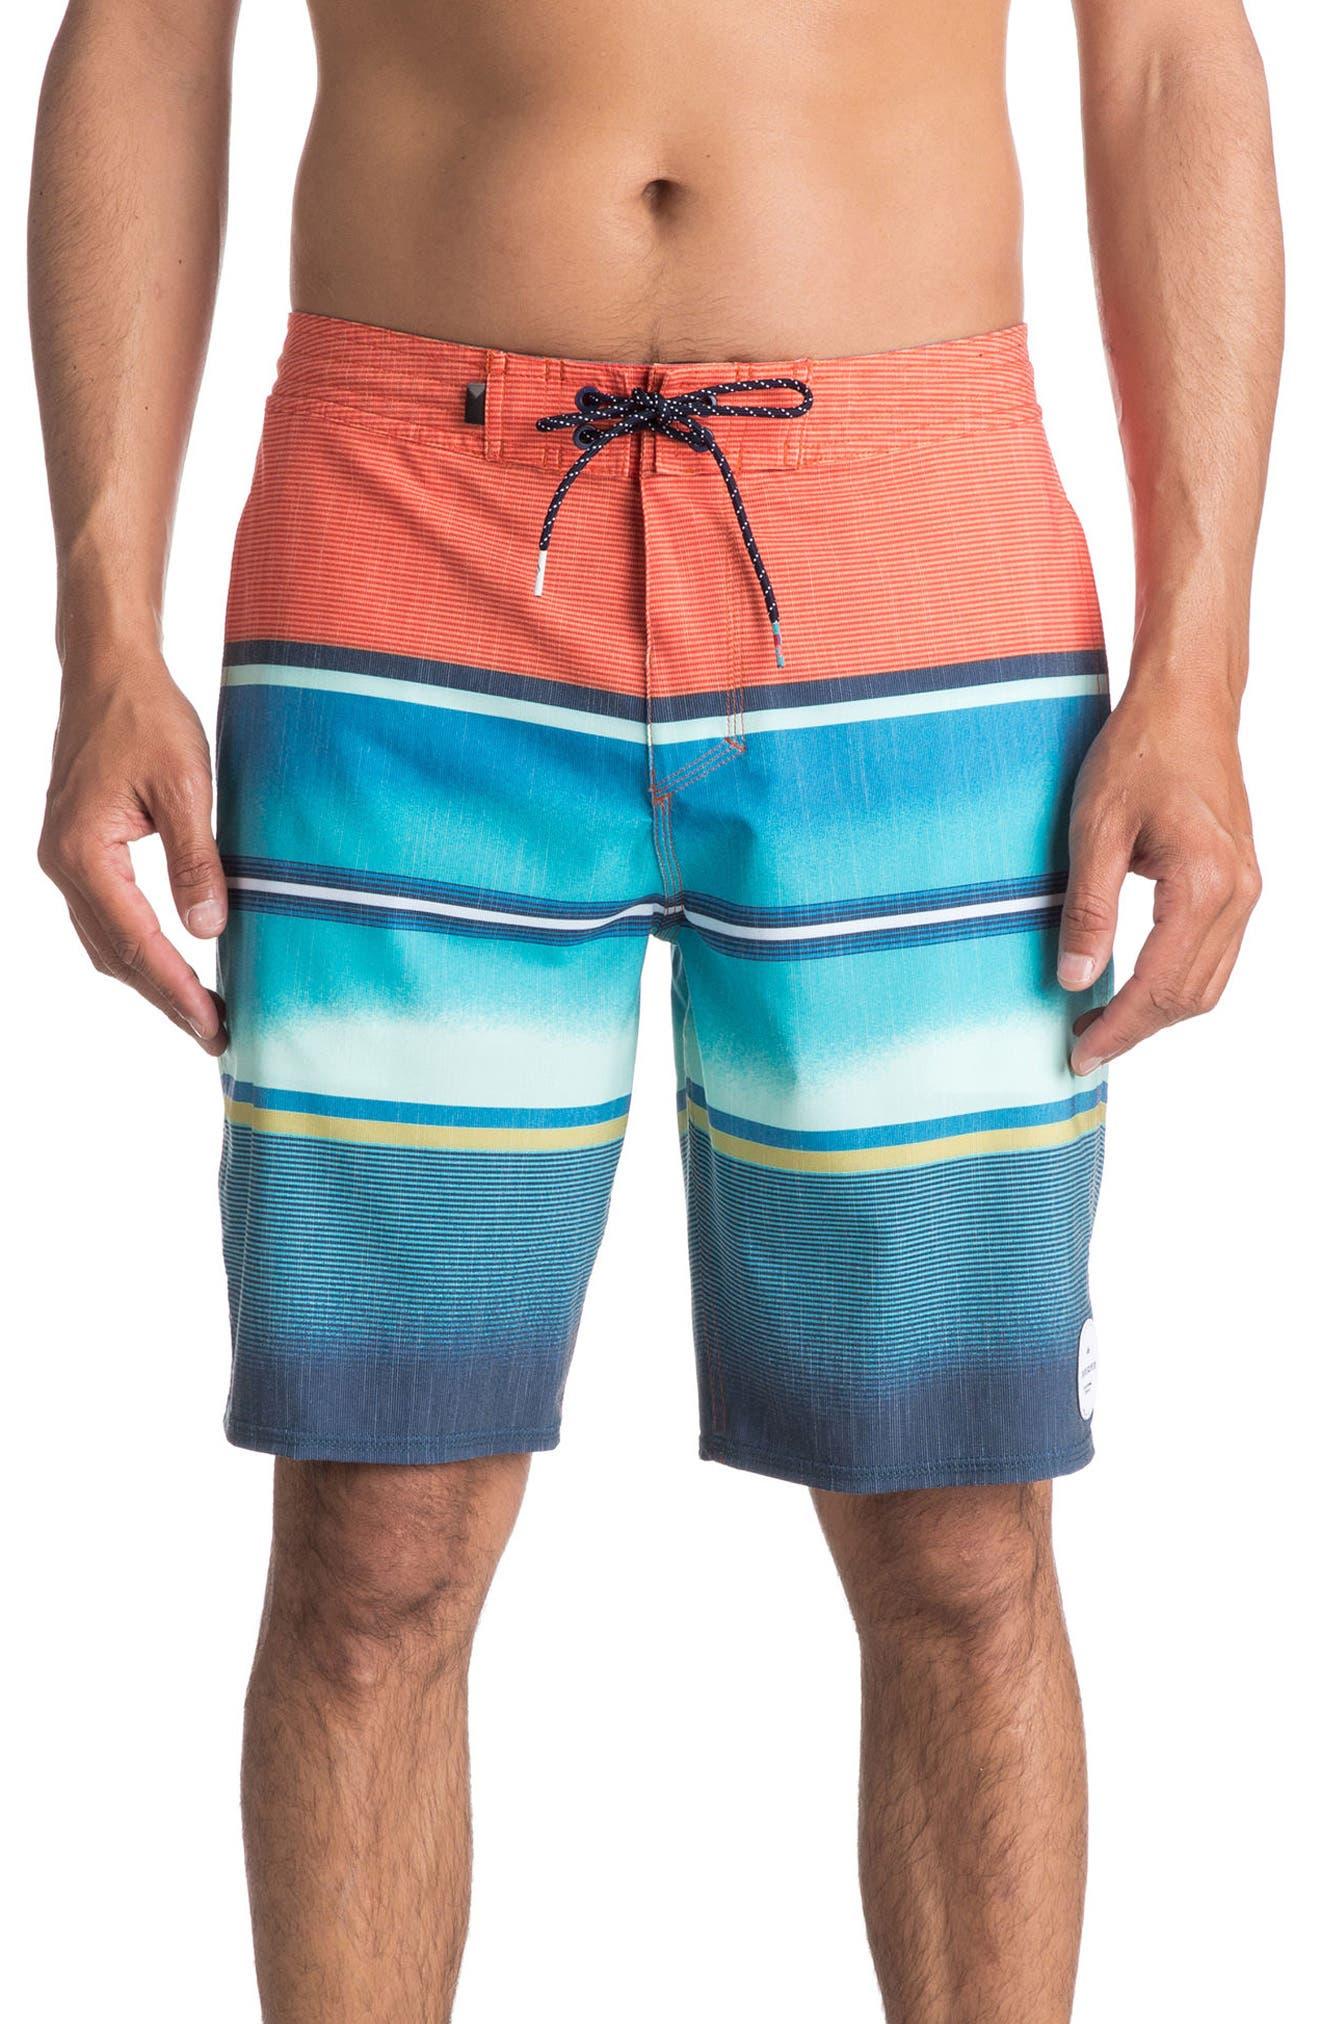 Swell Vision Board Shorts,                         Main,                         color, Coral Rose